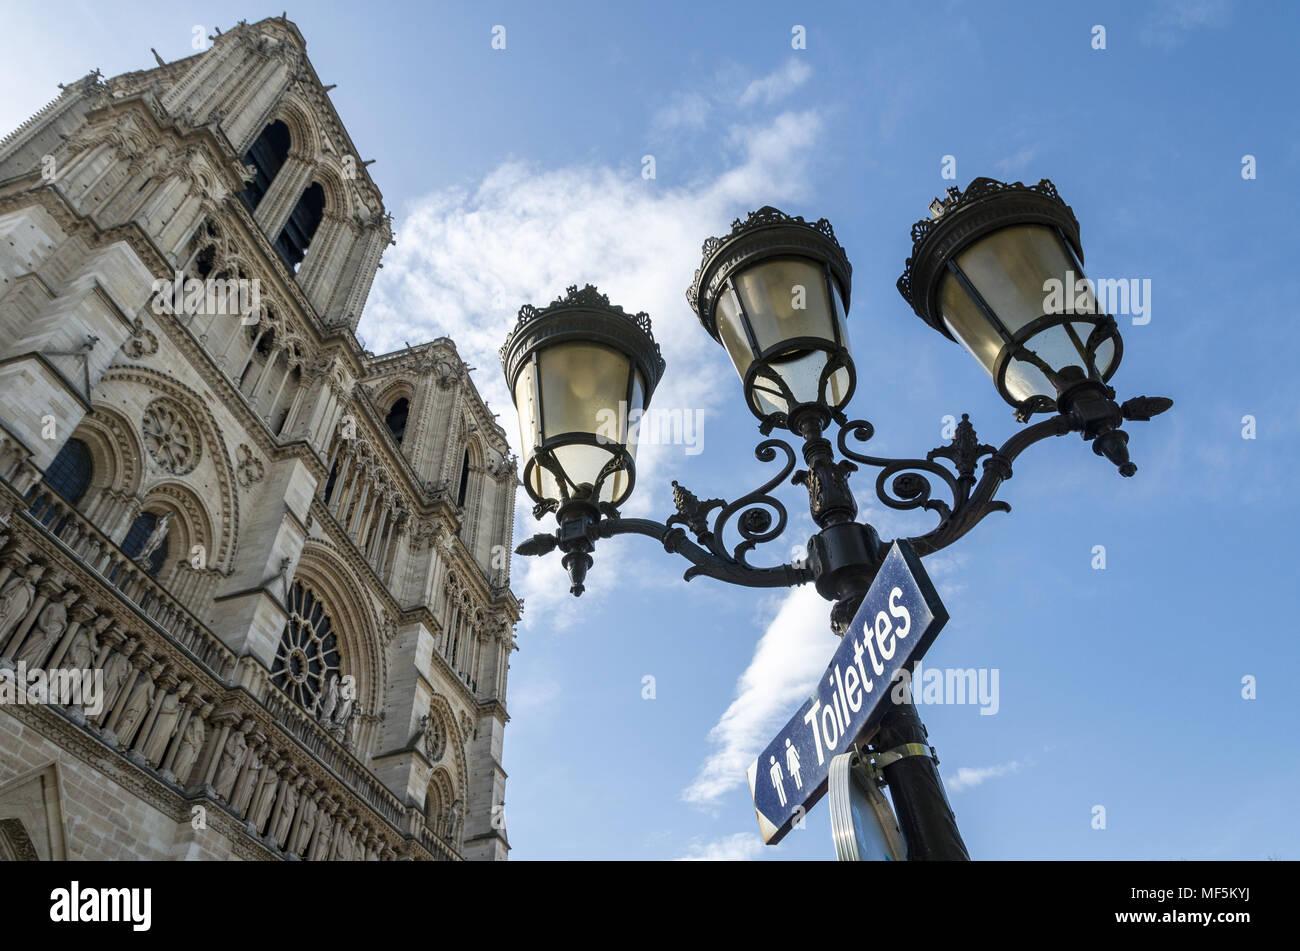 Low Angle View der Kathedrale Notre Dame gegen den Himmel in Paris Stockfoto